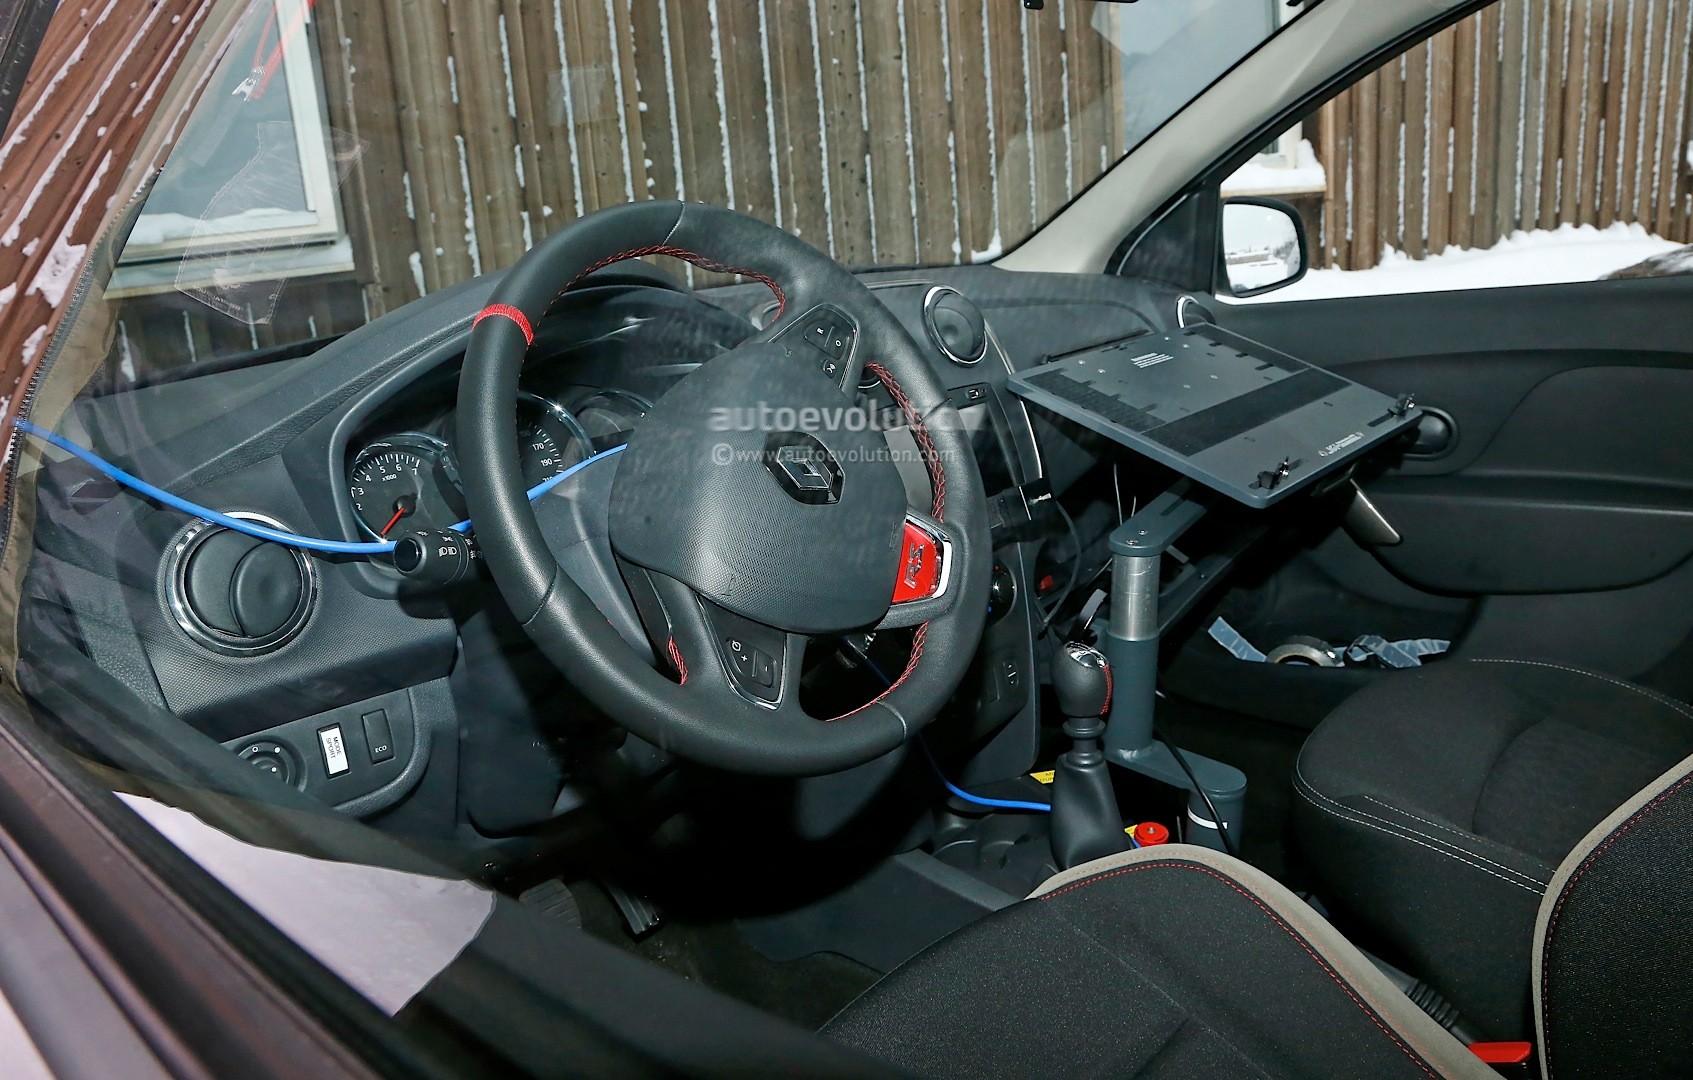 Spyshots: Dacia Sandero RS Getting 1.2 Turbo Engine, Sportier ...